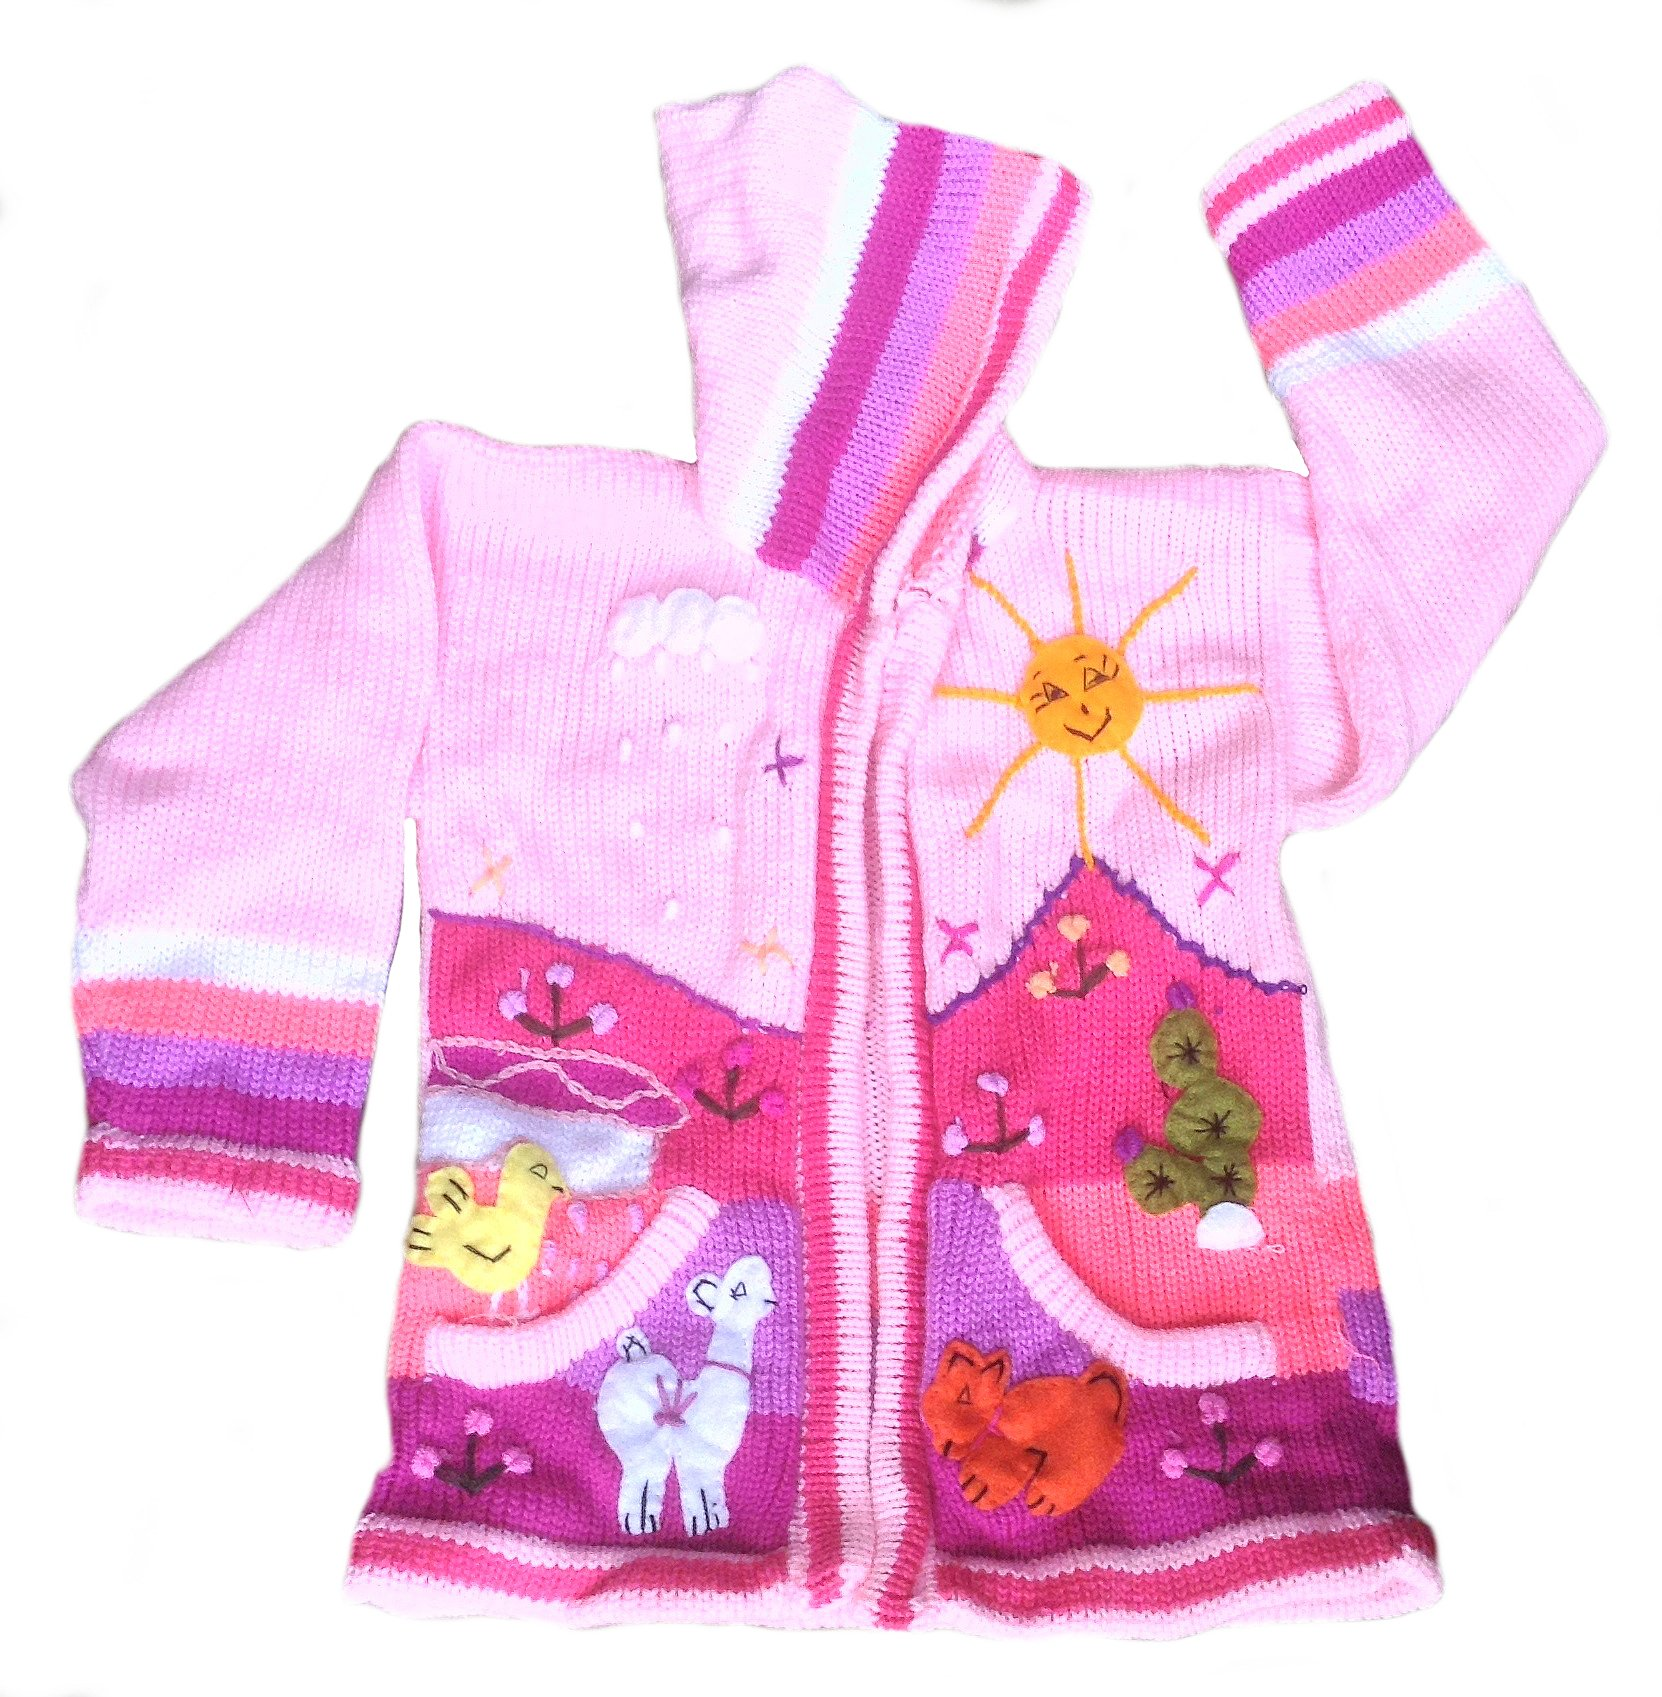 Alpakaandmore Girls Pink Toddler Hooded Cardigan, Peru Hand- Embroidered (4 Years)